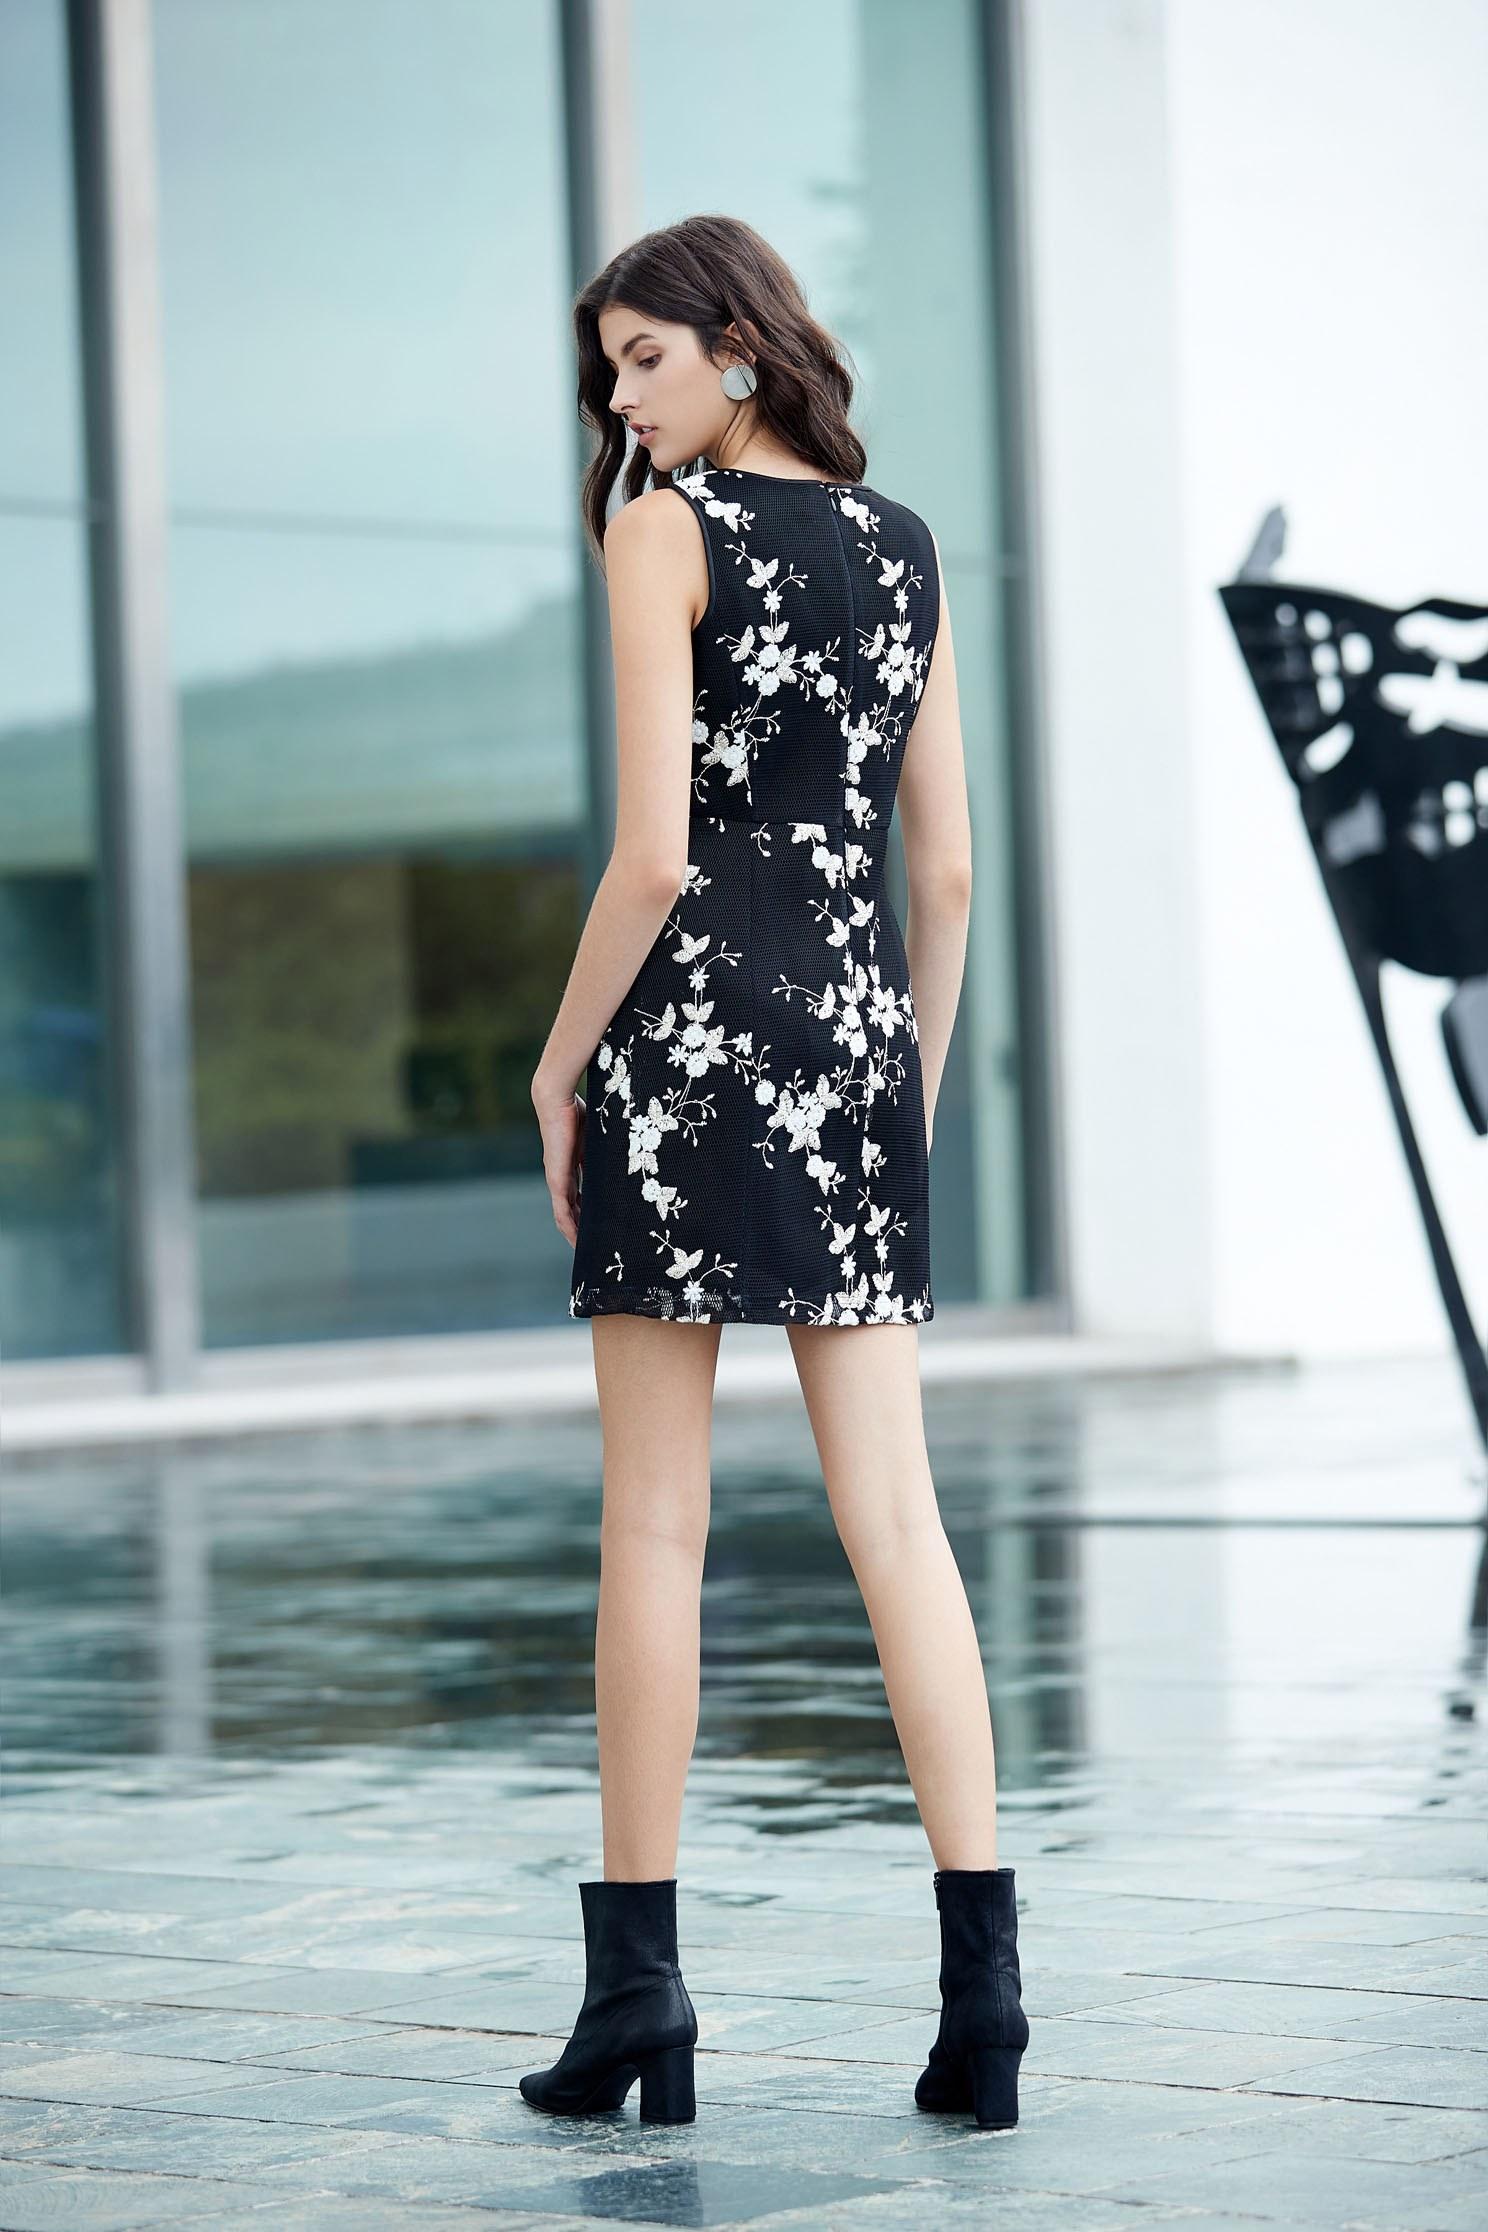 Graceful flowers emroidery dress,embroidery,刺繡洋裝,小禮服,無袖洋裝,embroidered